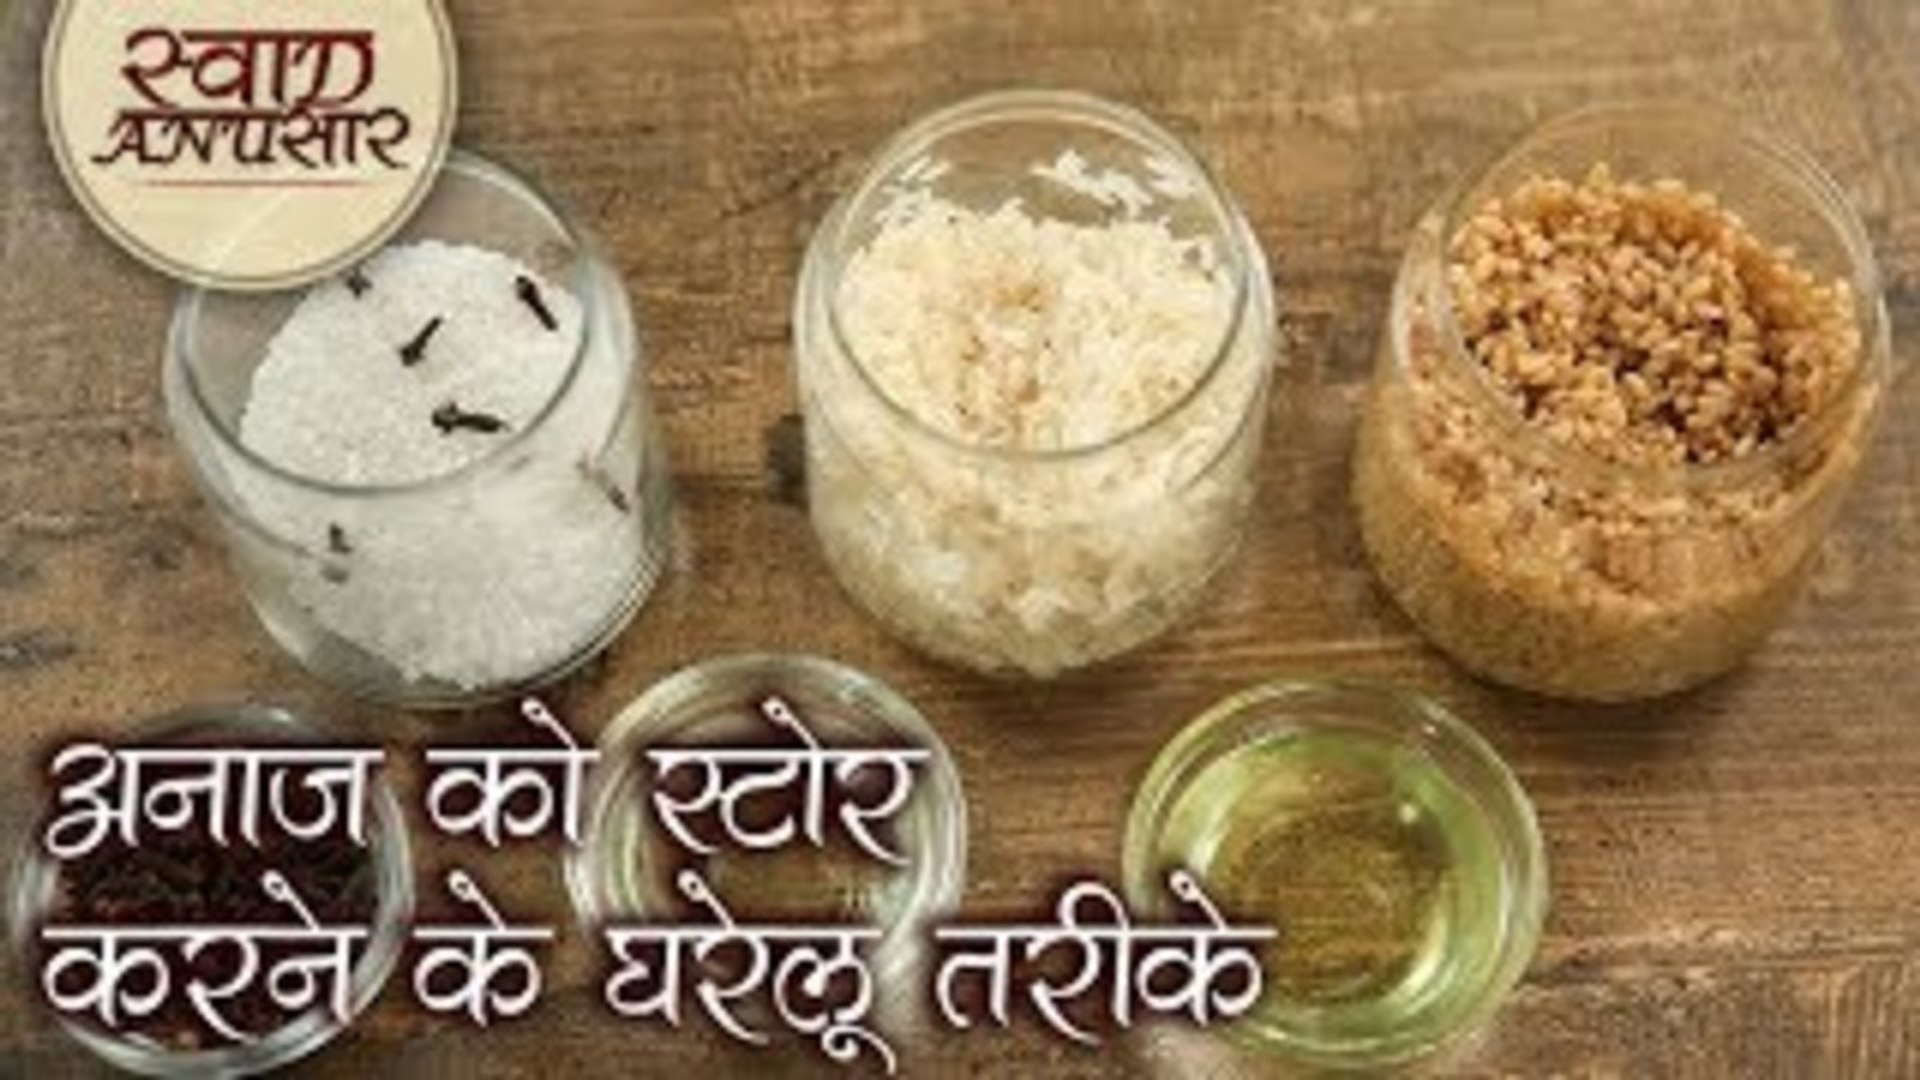 अनाज को स्टोर करने के घरेलू तरीके - How To Store Rice, Wheat And Sugar For Long Time - Toral